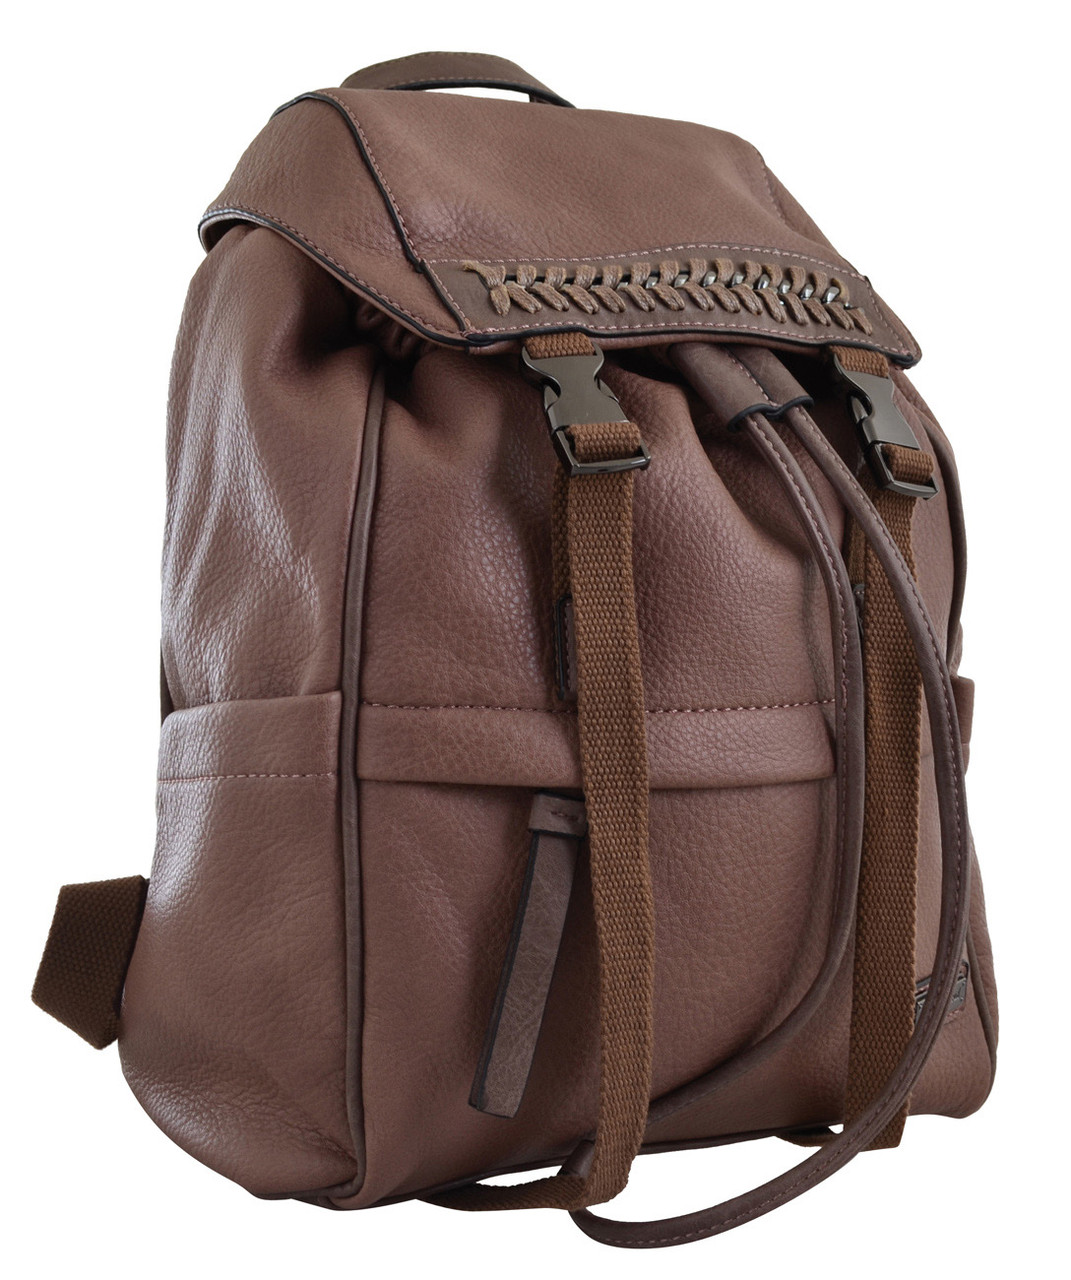 Рюкзак женский YES YW-12, коричневый